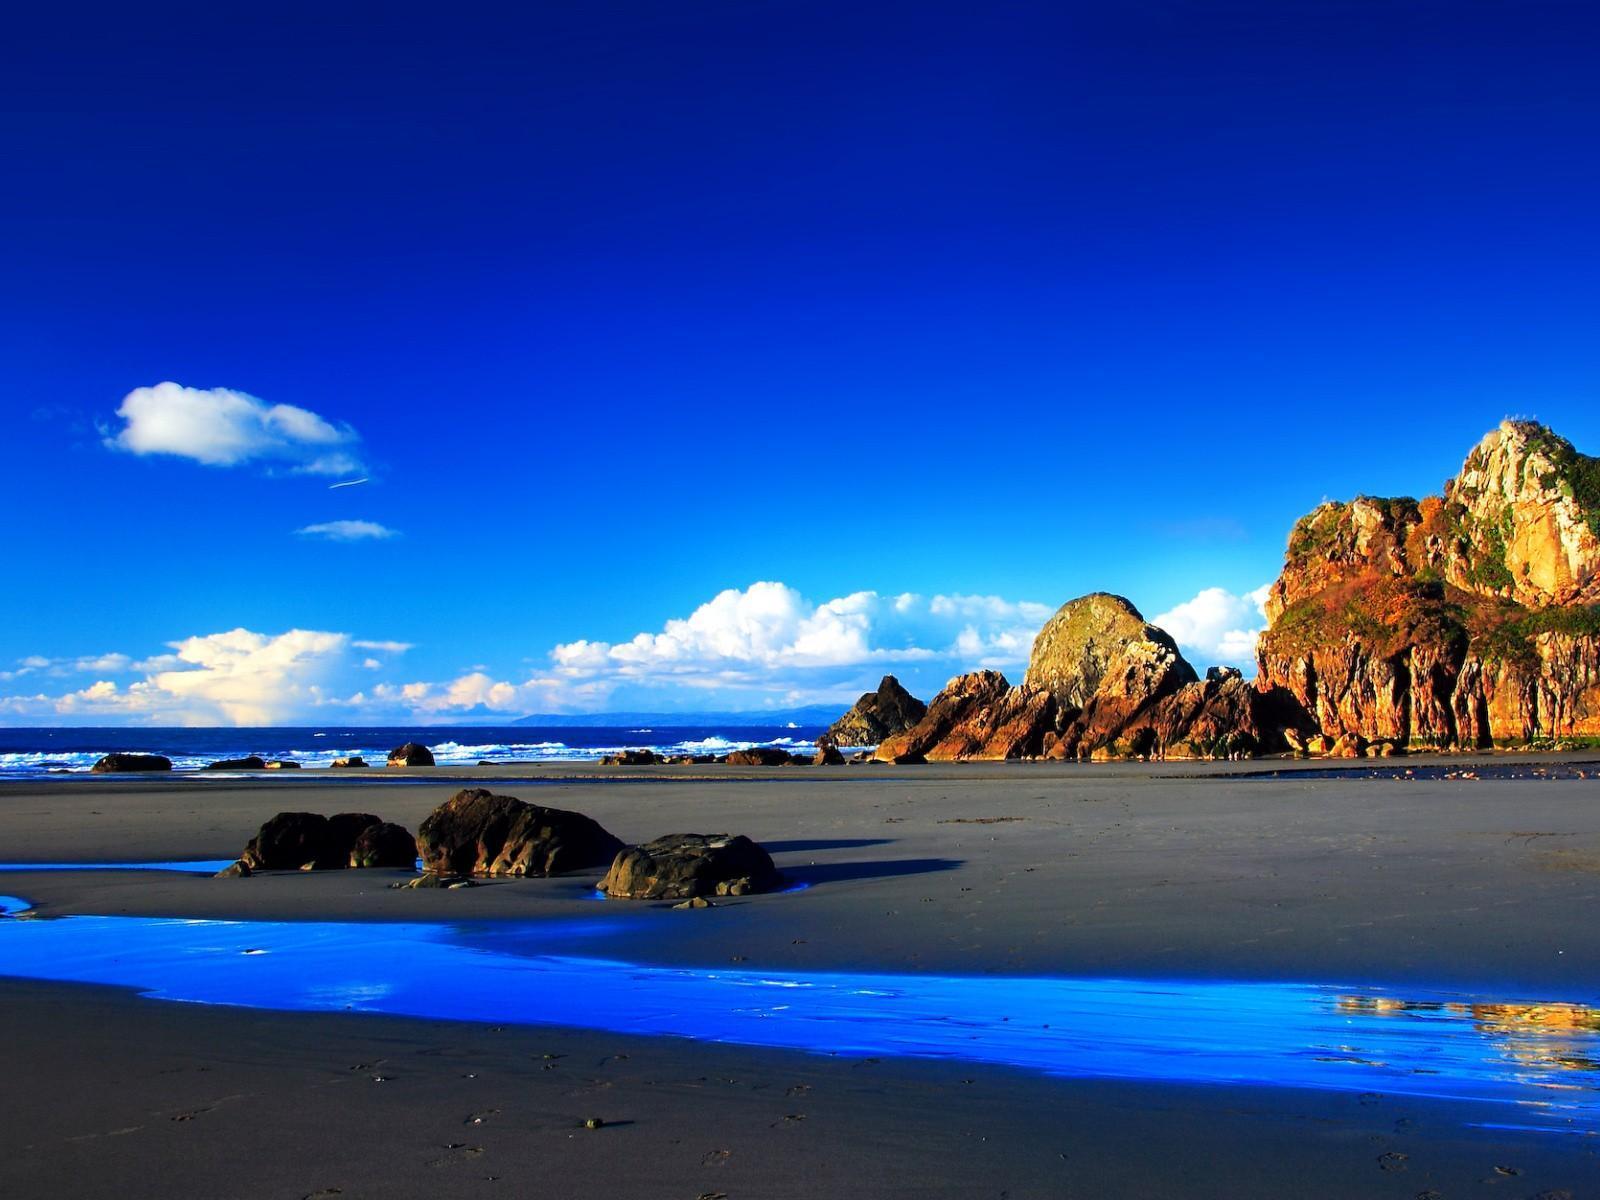 Fotos de paisajes hermosos del mundo para fondo de pantalla for Paisajes para una pared